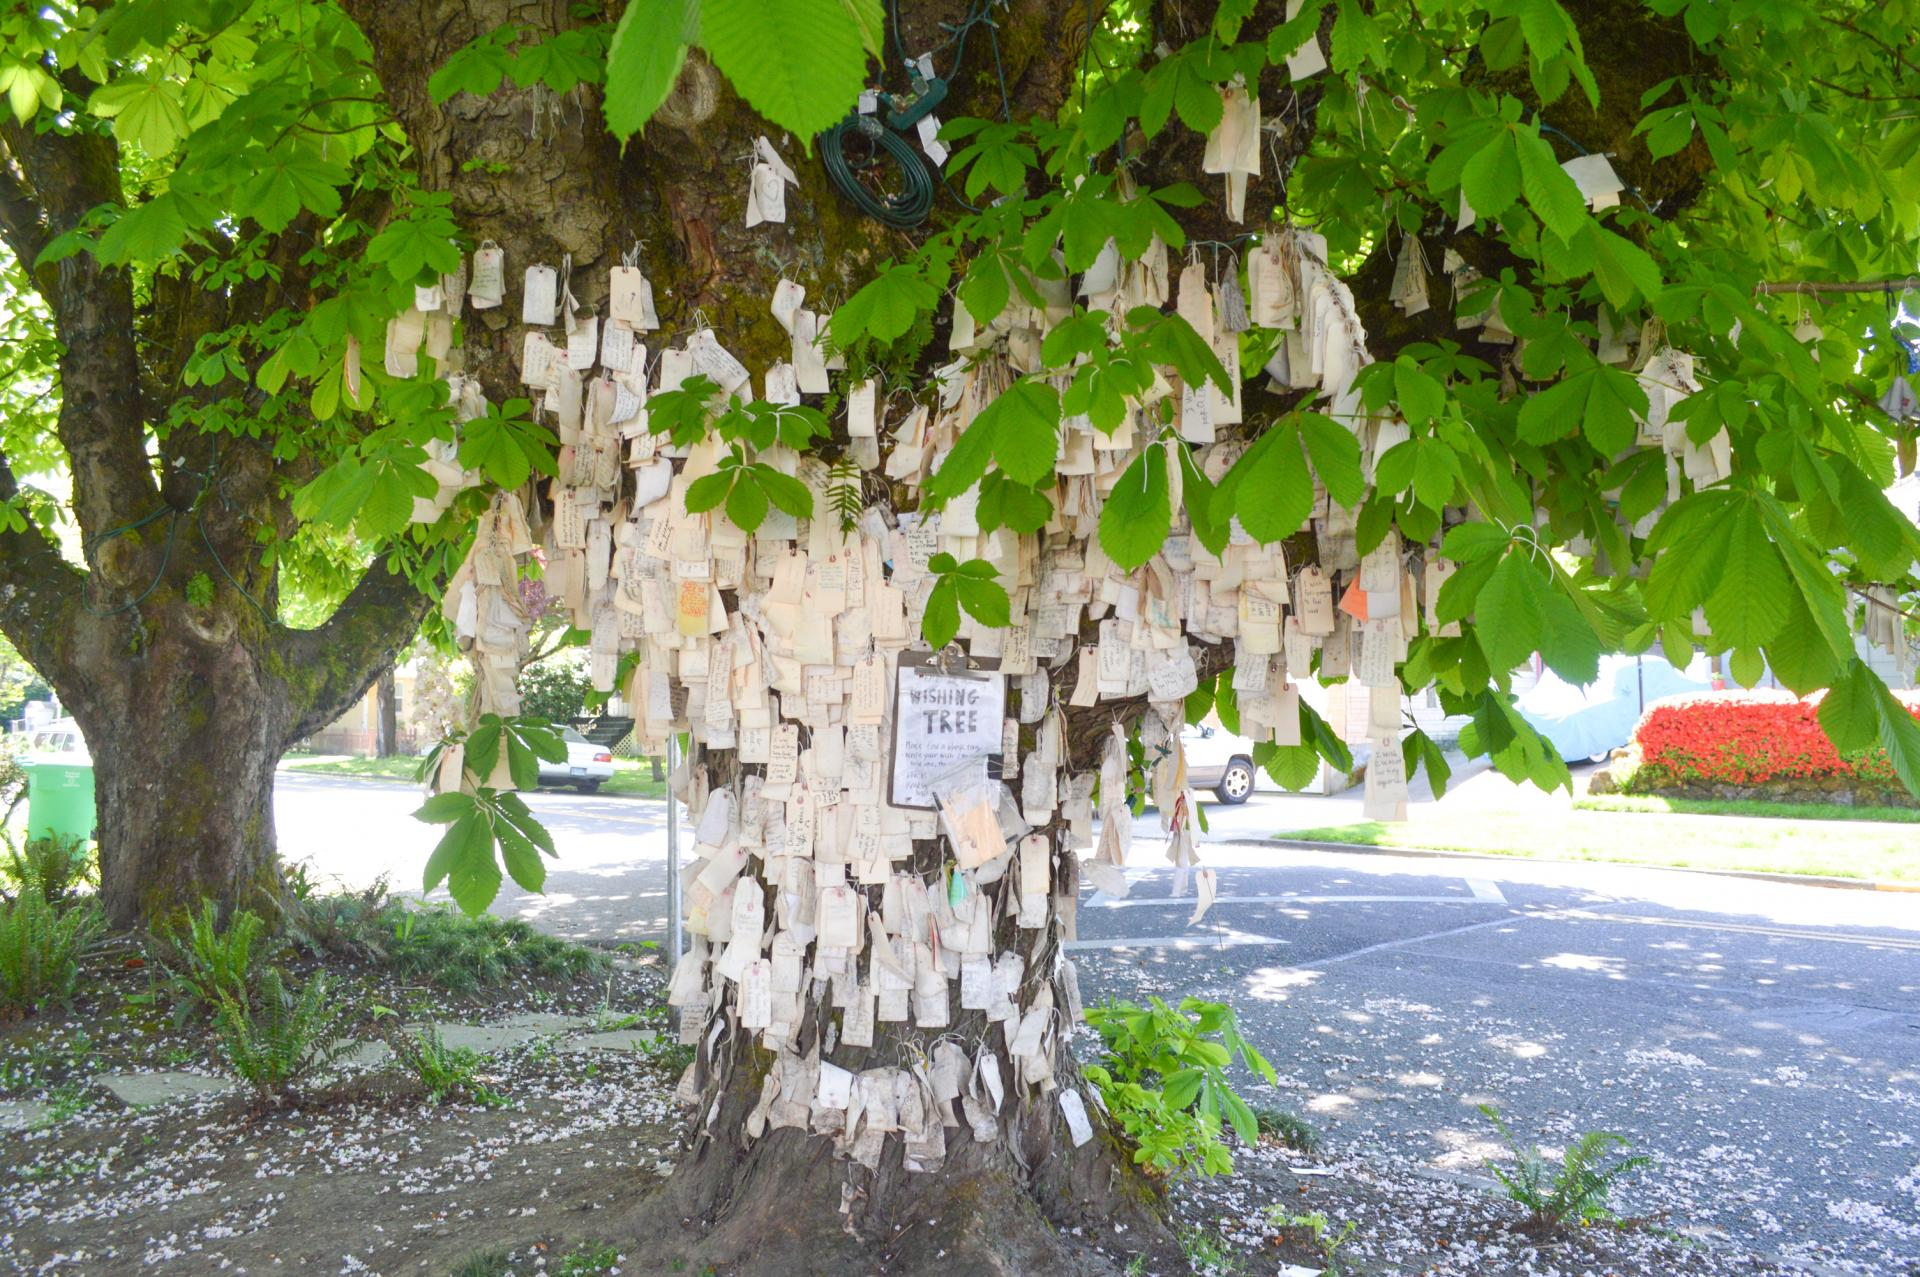 Portland Wishing Tree